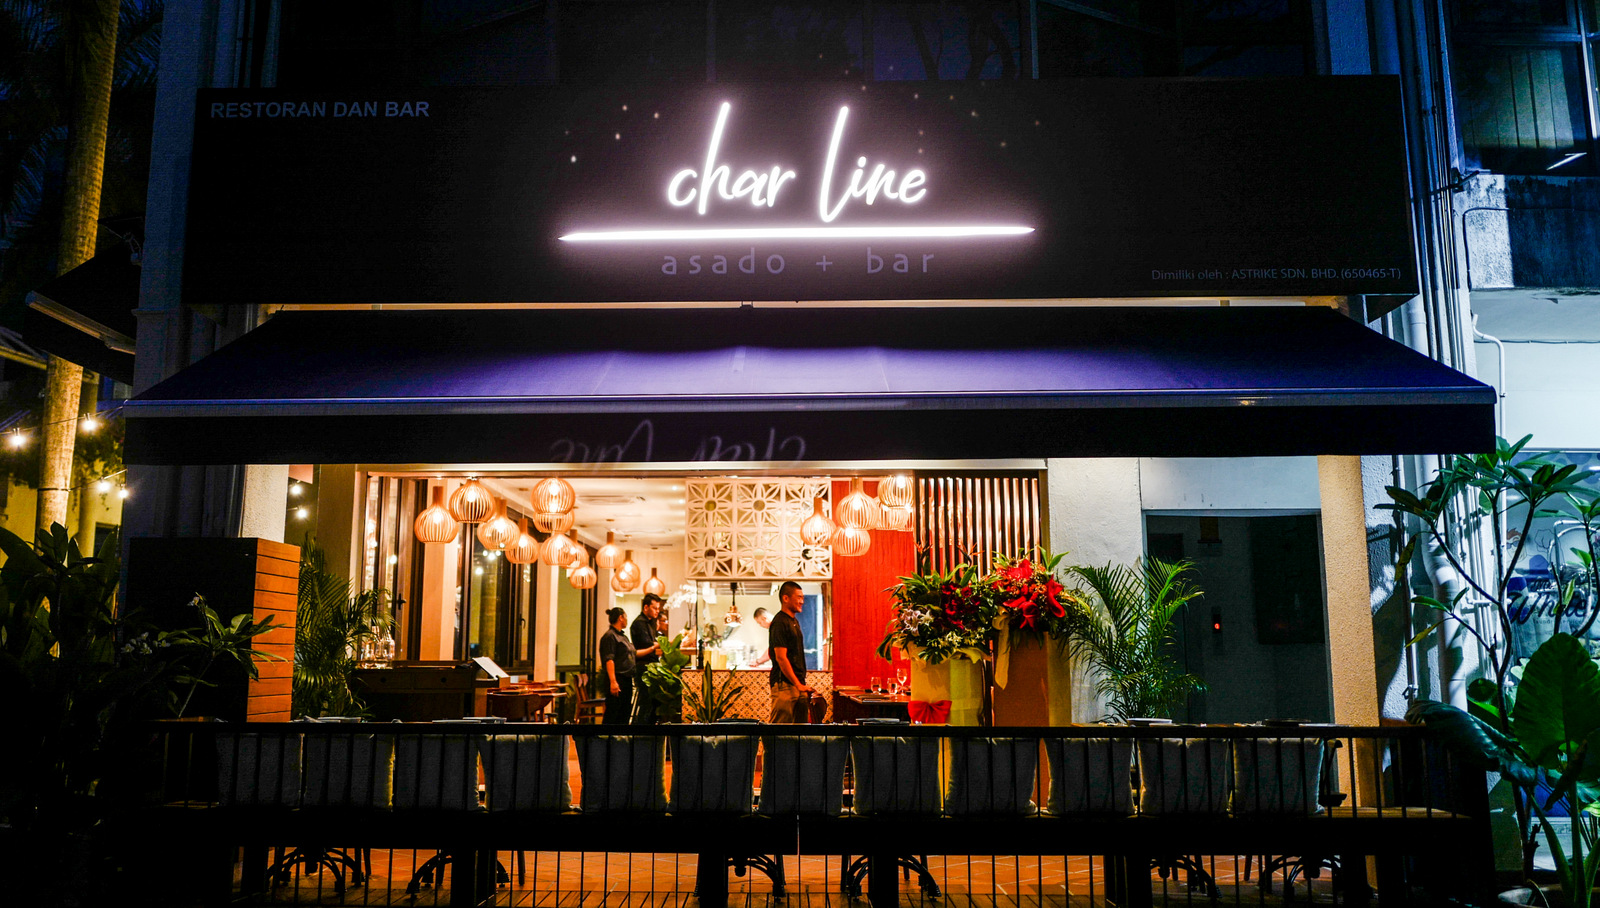 Char Line